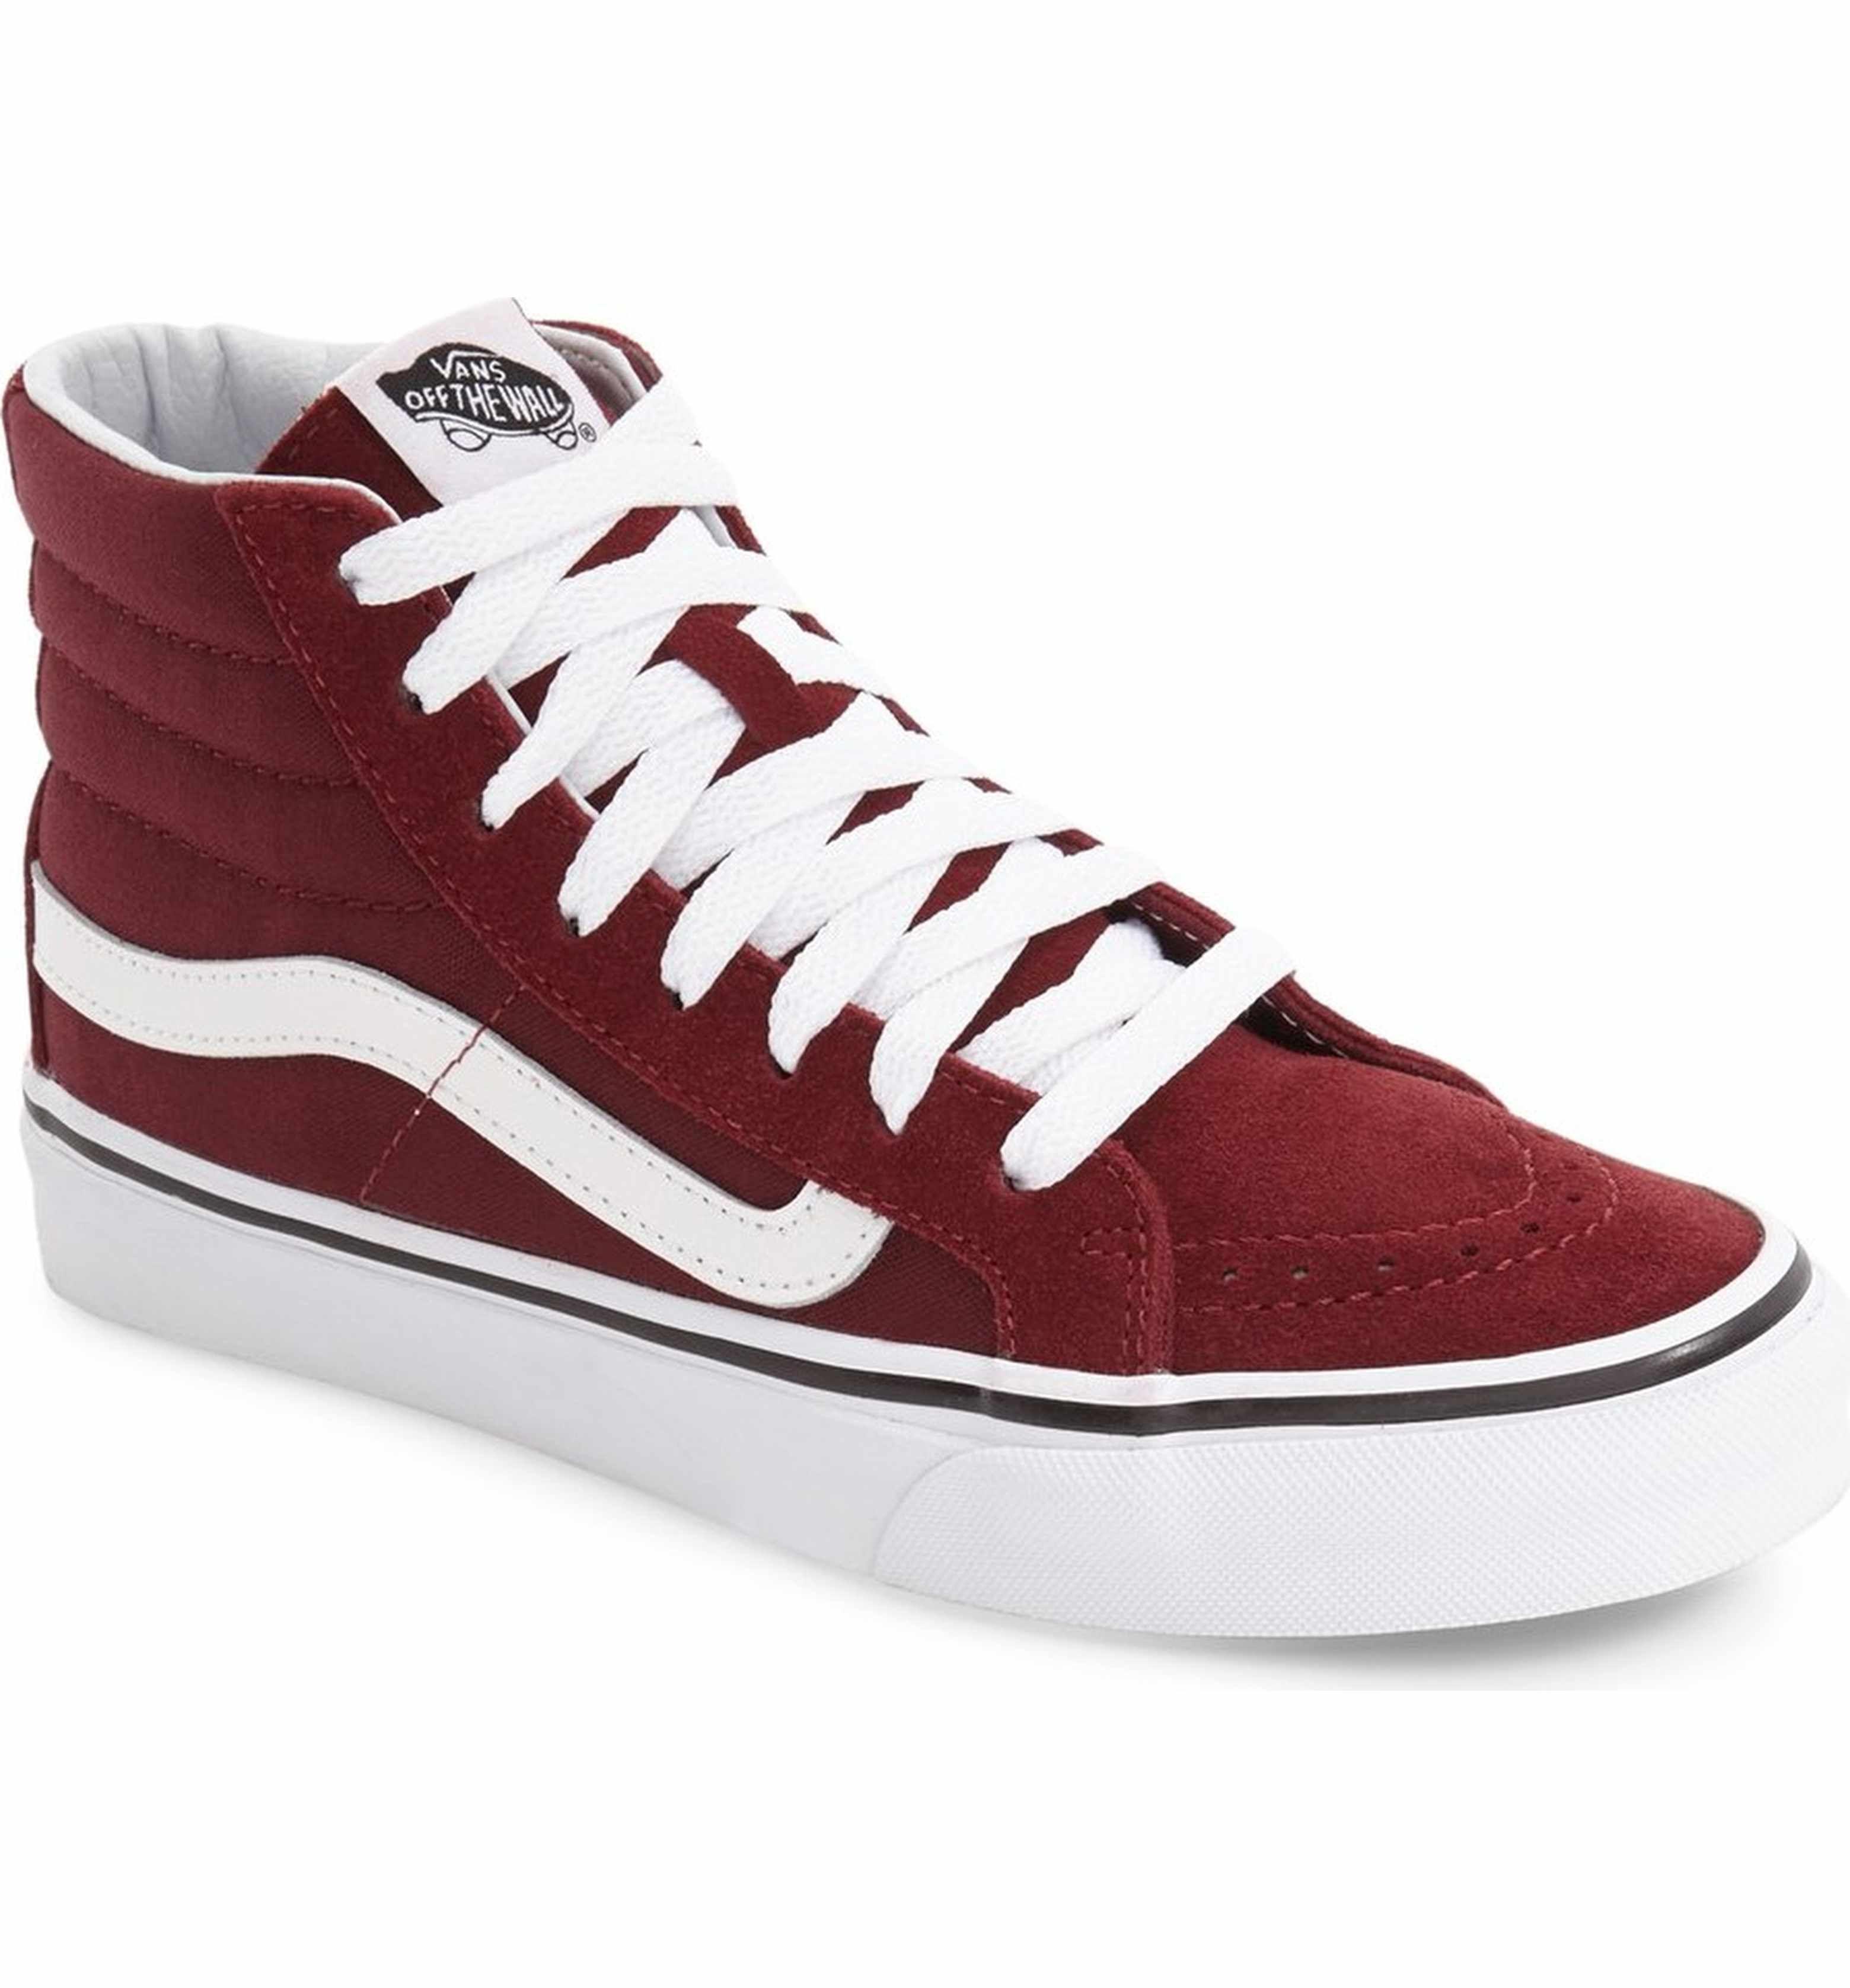 234f5cef2c3600 Vans Sk8-Hi Slim High Top Sneaker (Women)